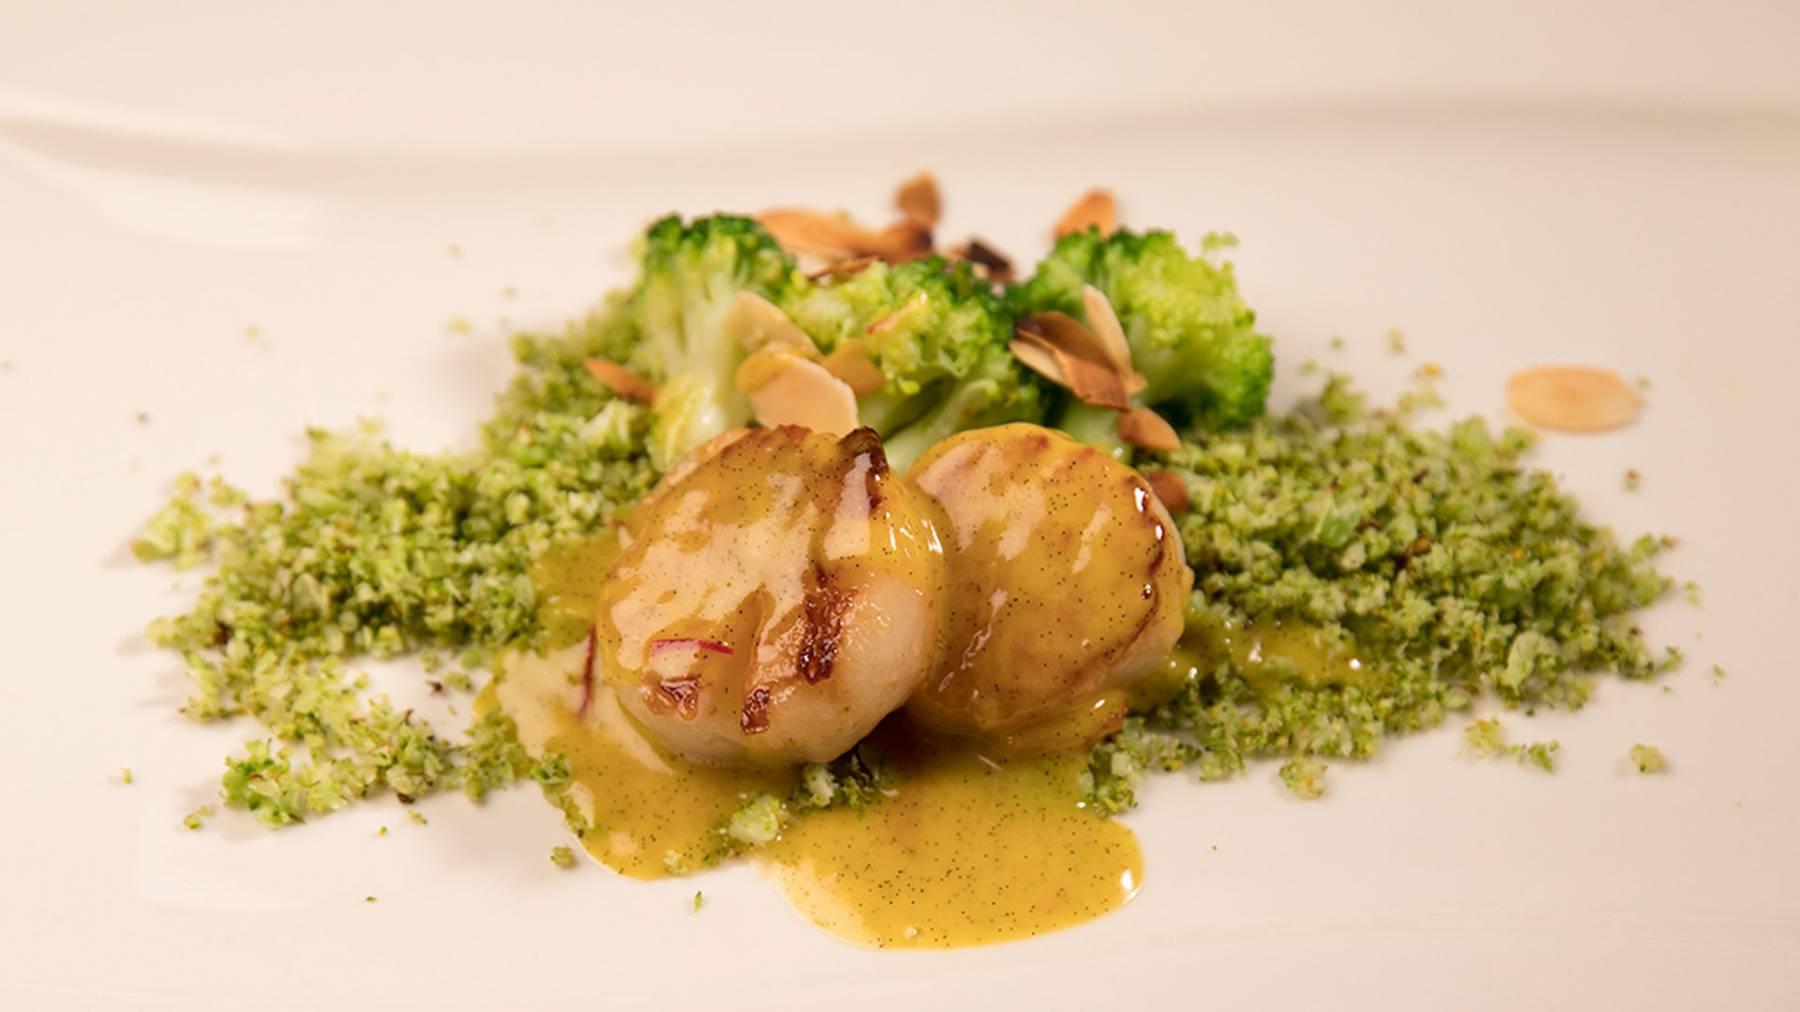 Jakobsmuscheln mit Broccoli-Couscous